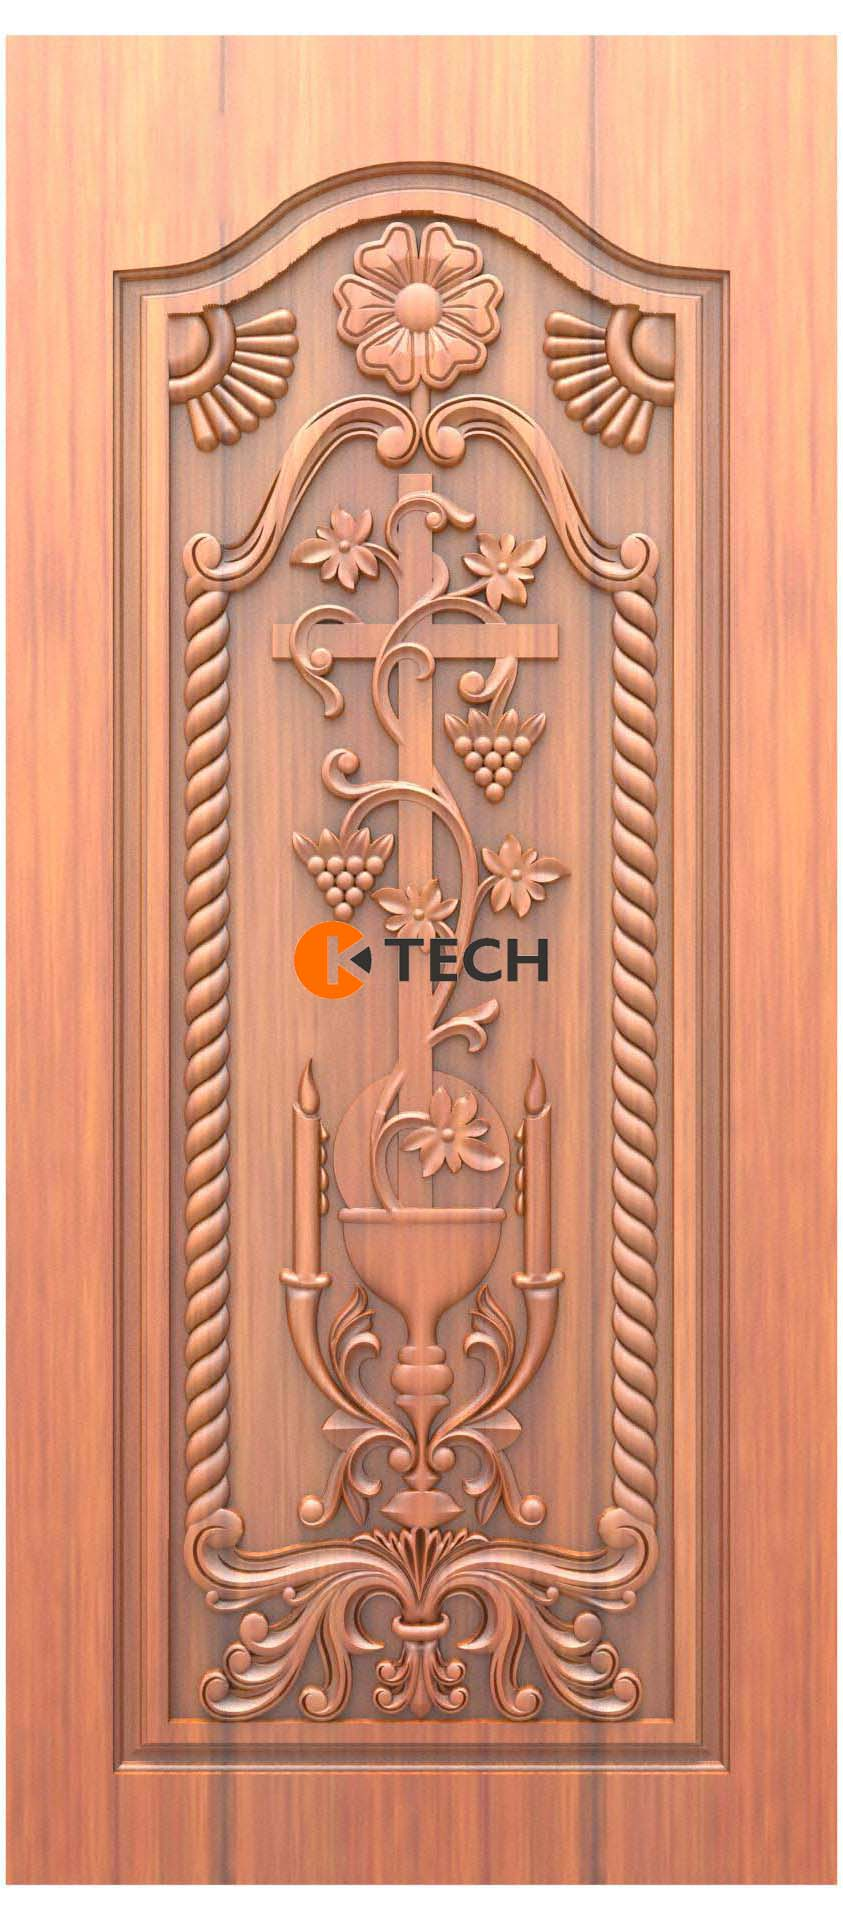 K-TECH CNC Doors Design 167